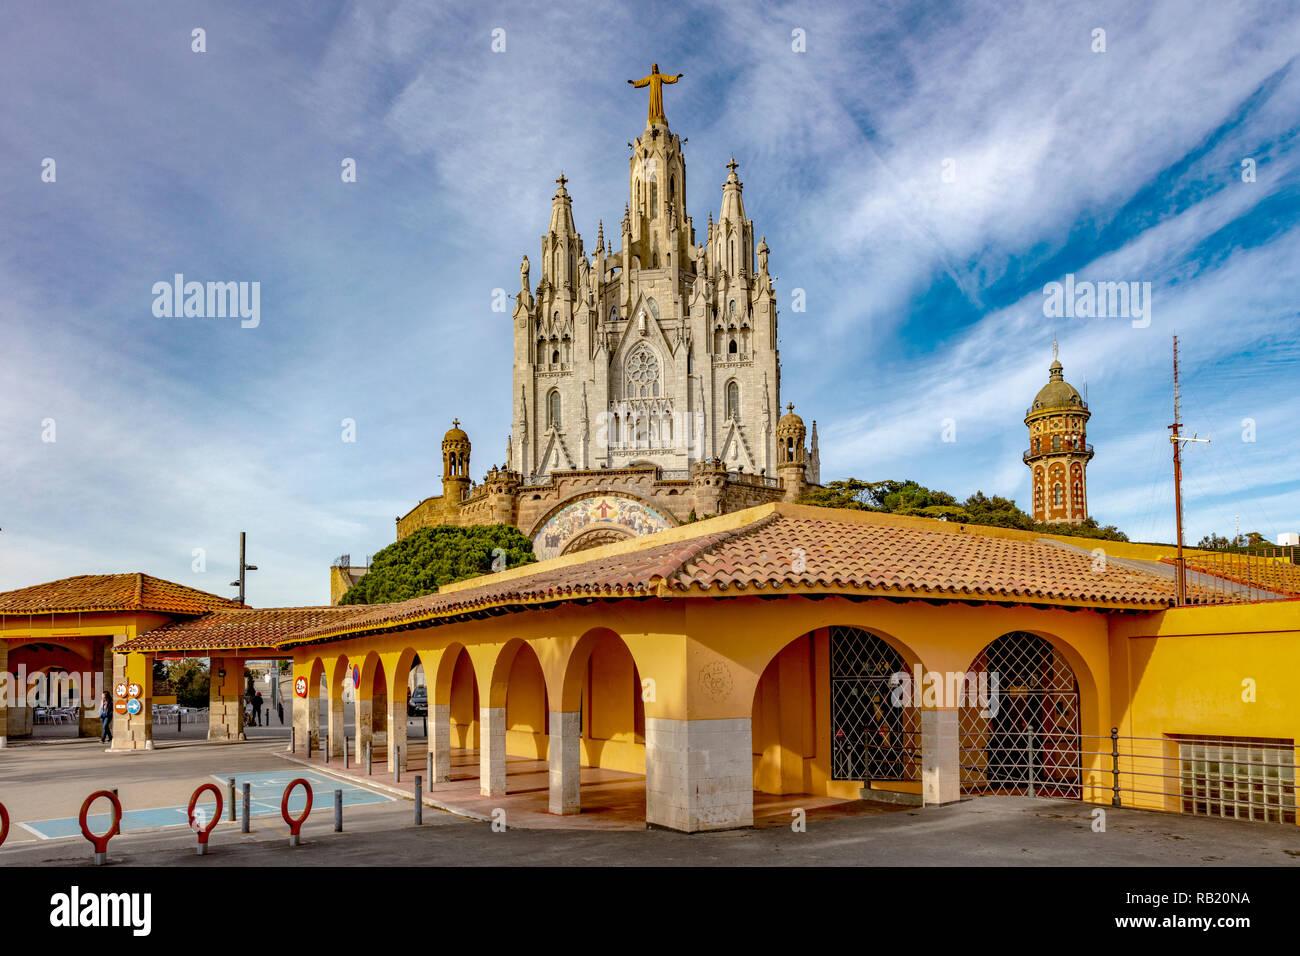 Kirche Sagrat Cor, Tibidabo, Barcelona, Katalonien, Spanien - Stock Image